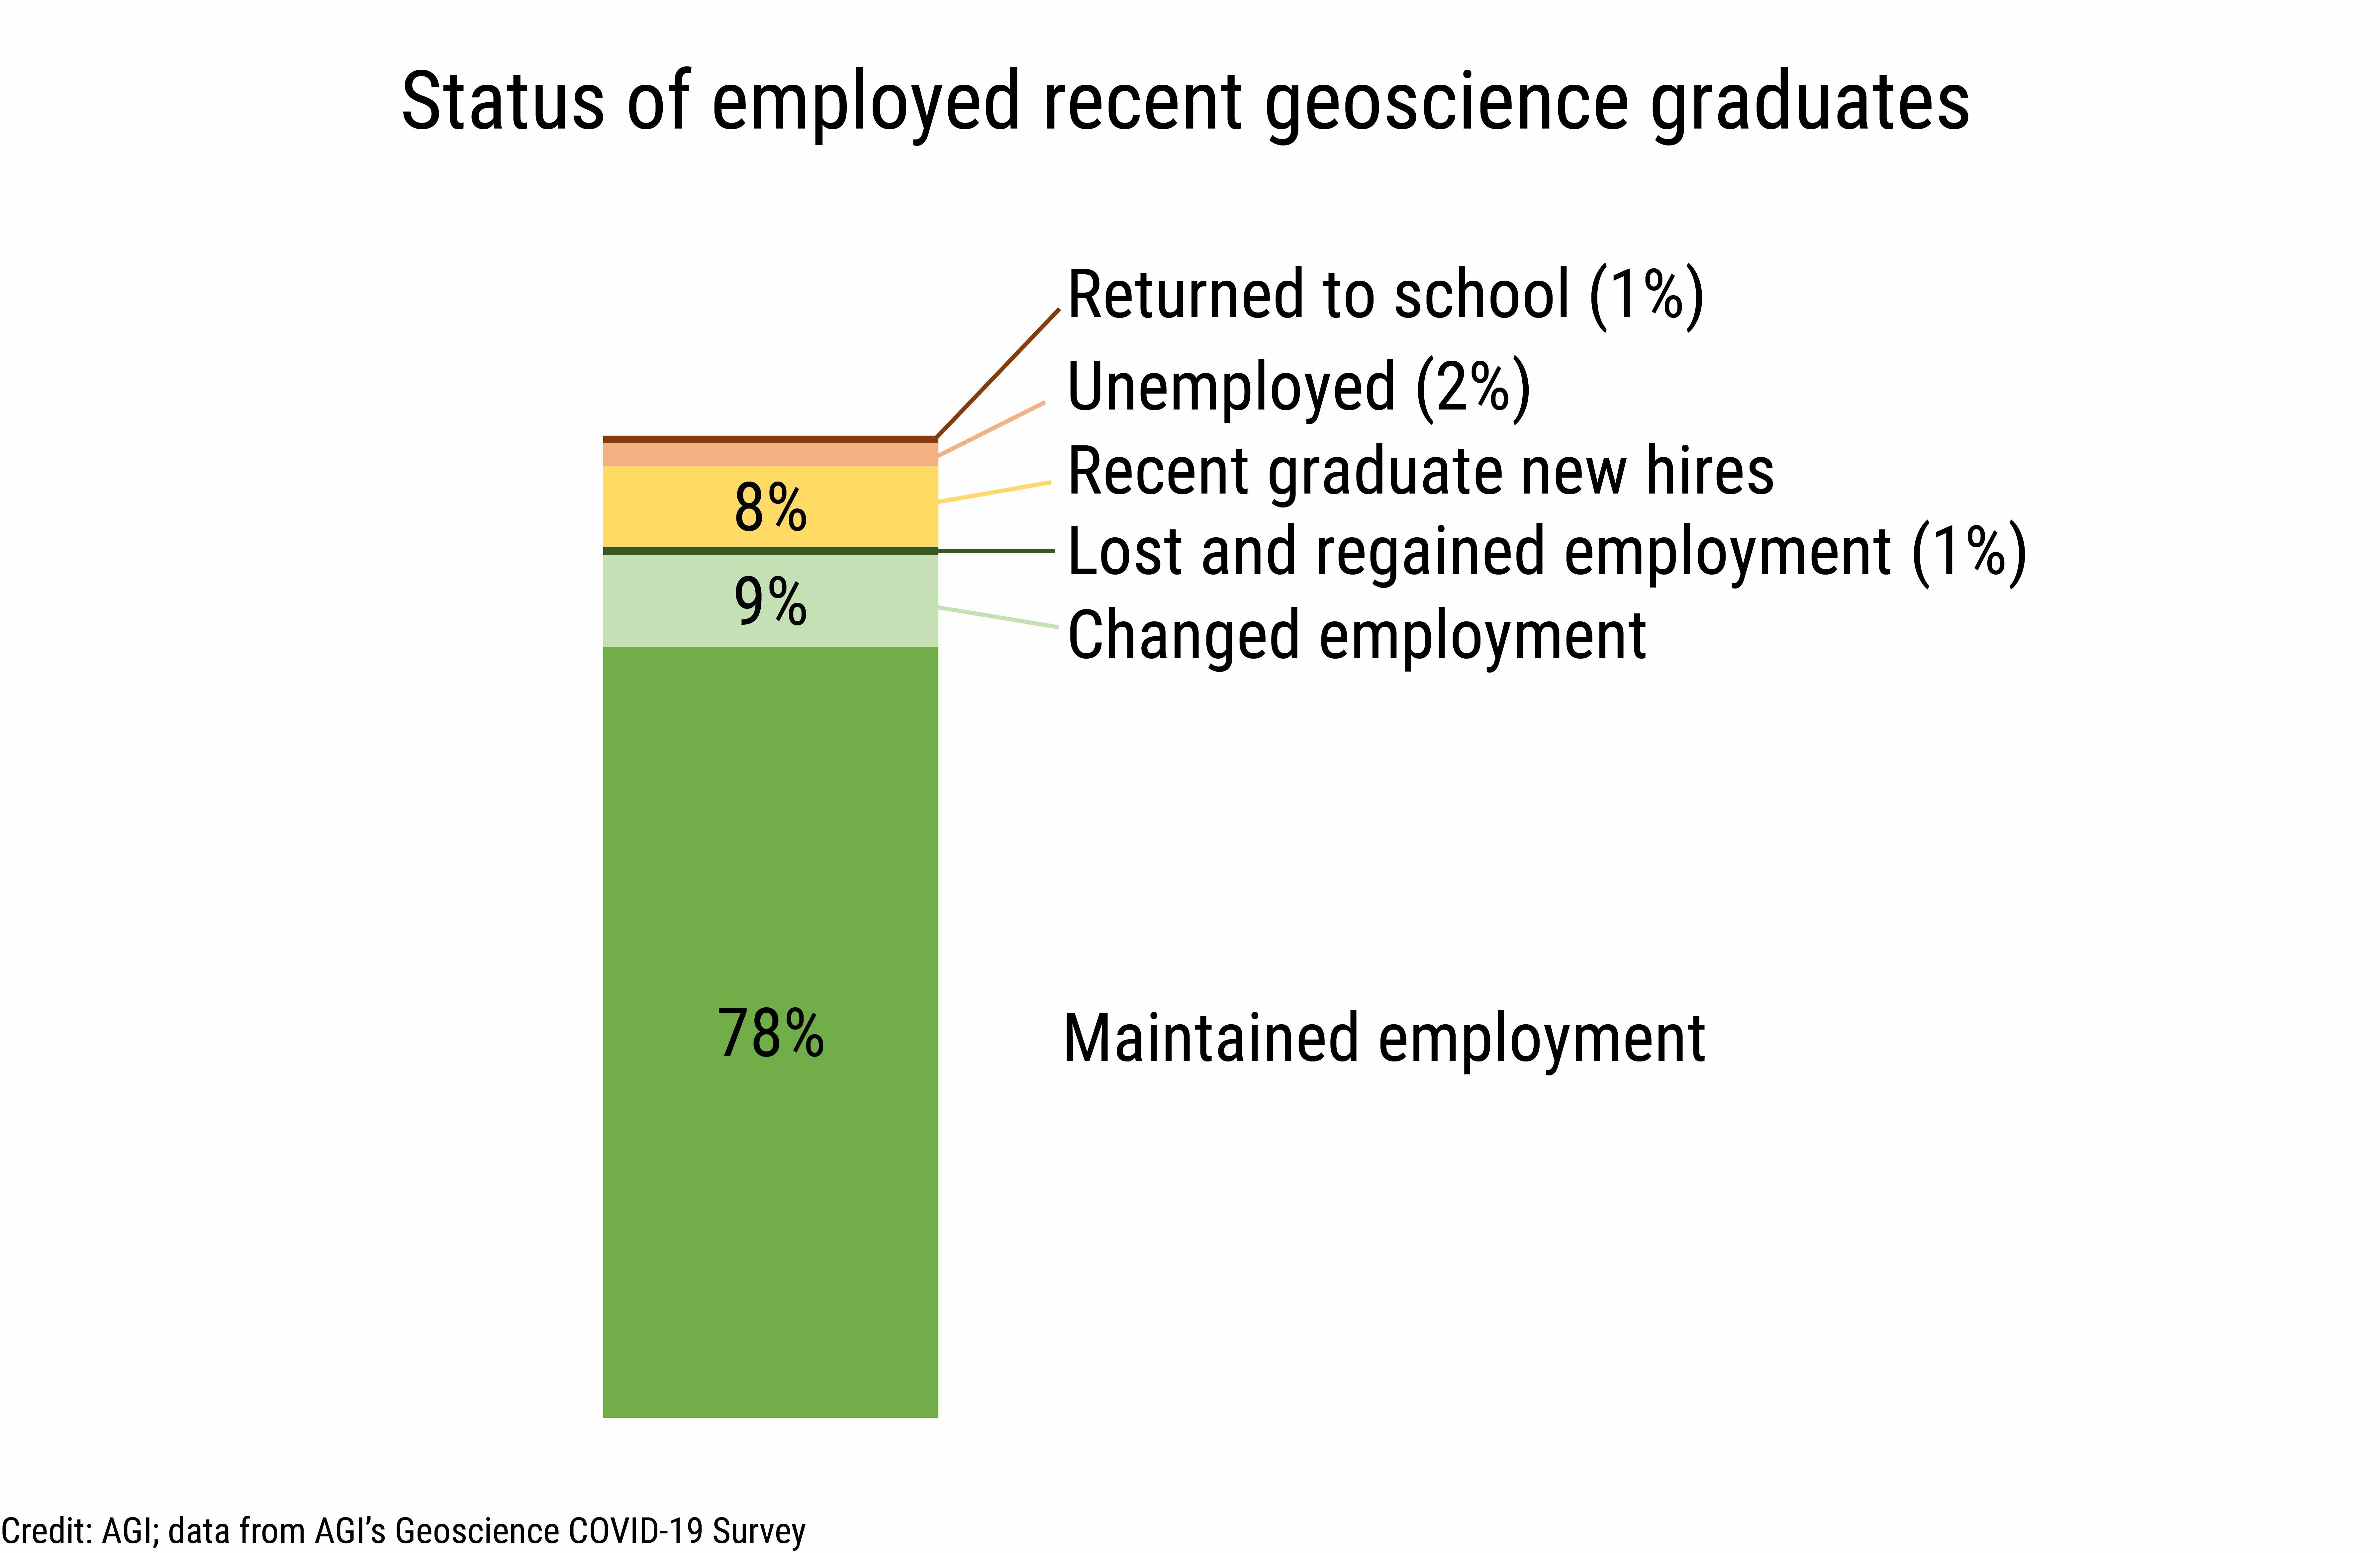 DB_2021-003_chart09: Status of employed recent geoscience graduates (Credit: AGI; data from AGI's Geoscience COVID-19 Survey)